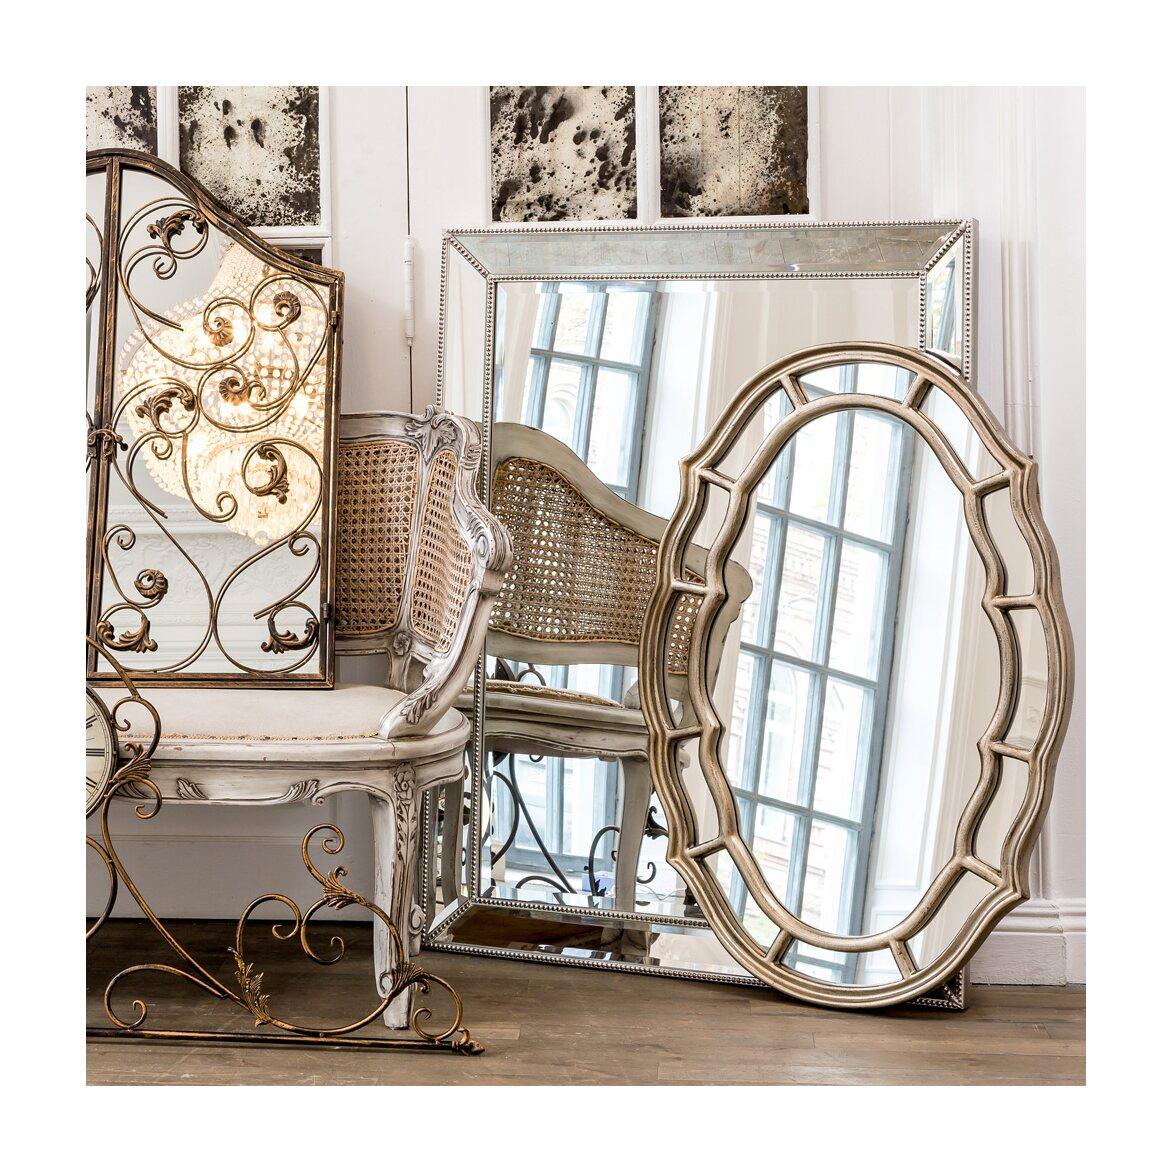 Настенное зеркало «Марлен» 2 | Настенные зеркала Kingsby